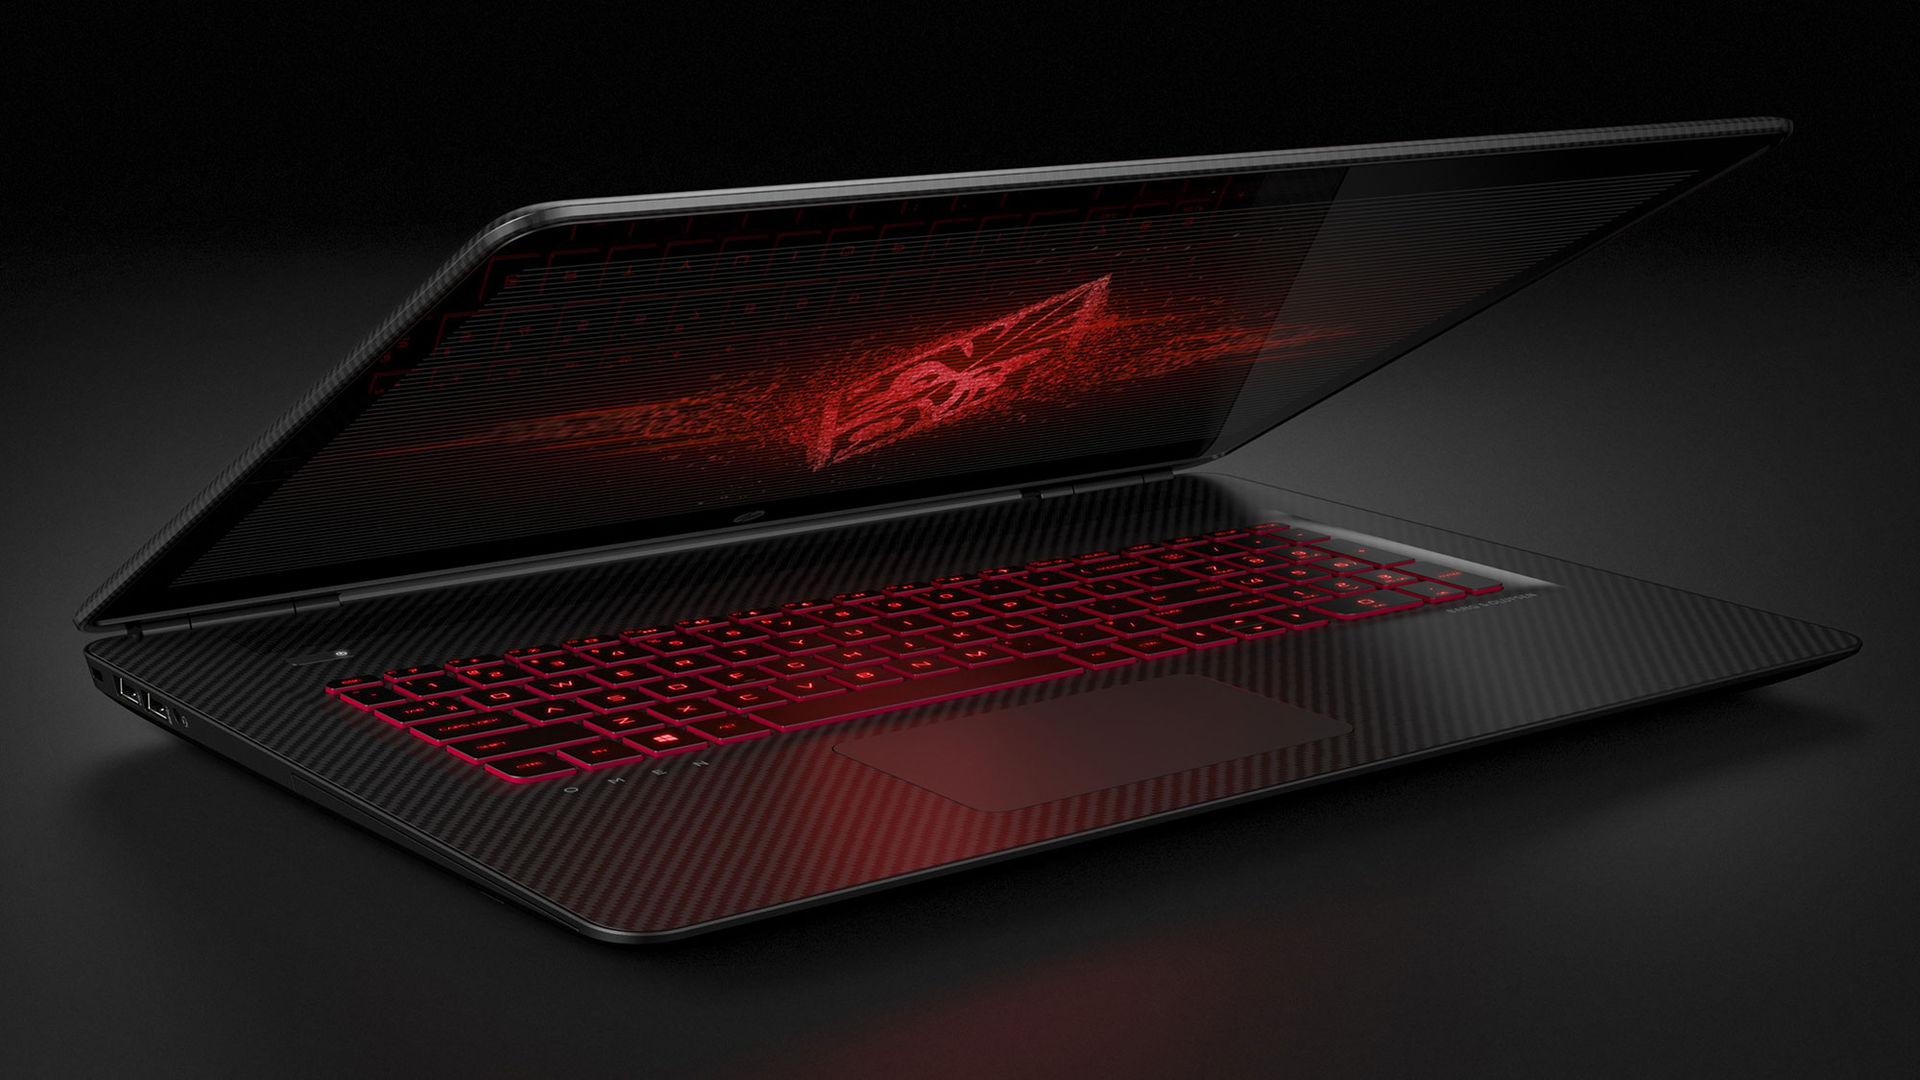 HP presenterar nya speldatorer